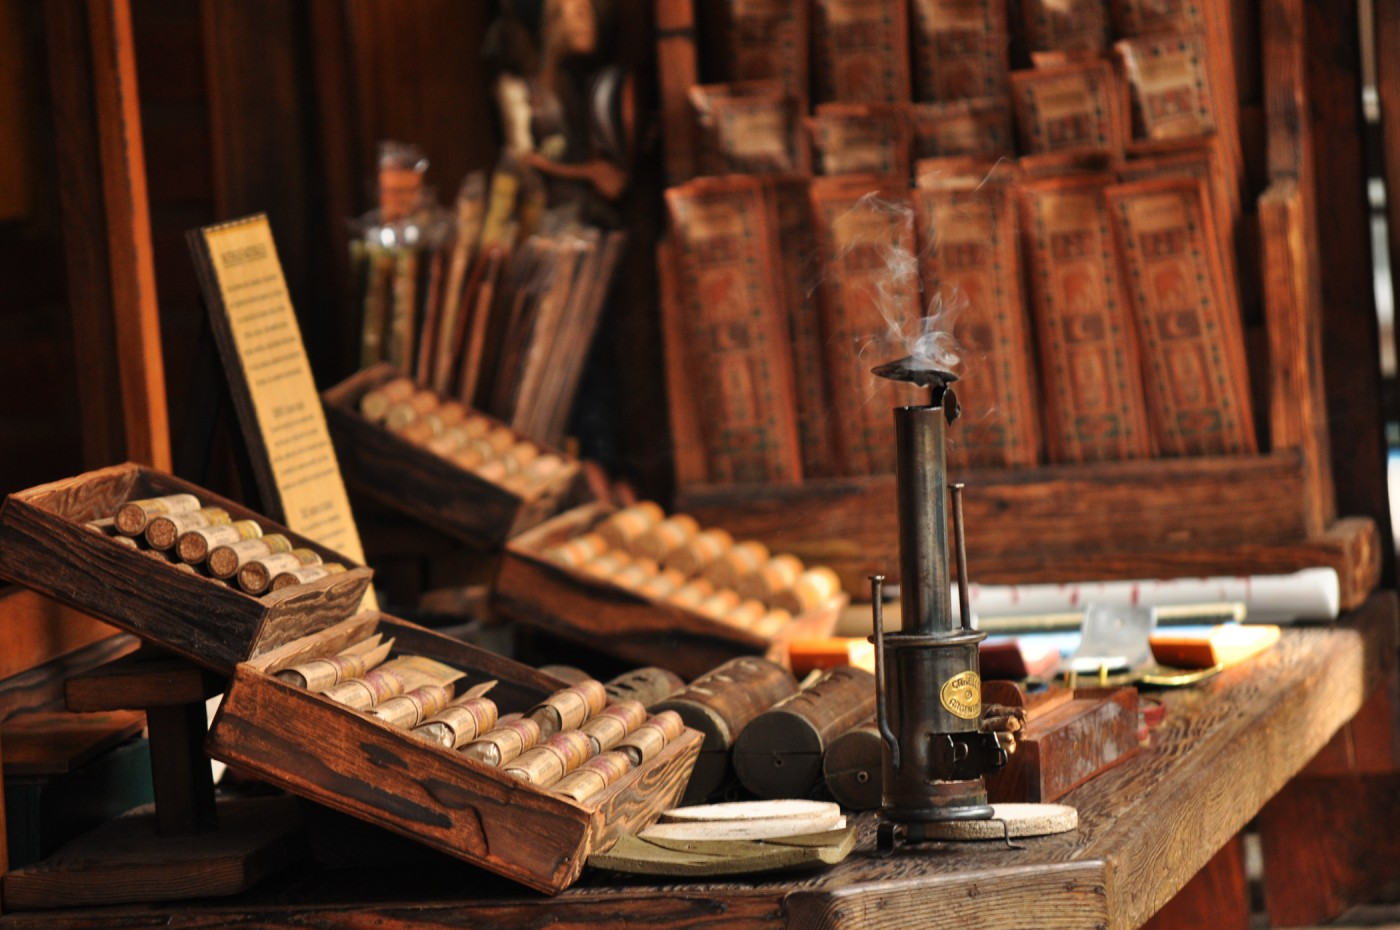 XV Cuban Cigars Habanos Festival - centuries of fascinating tradition